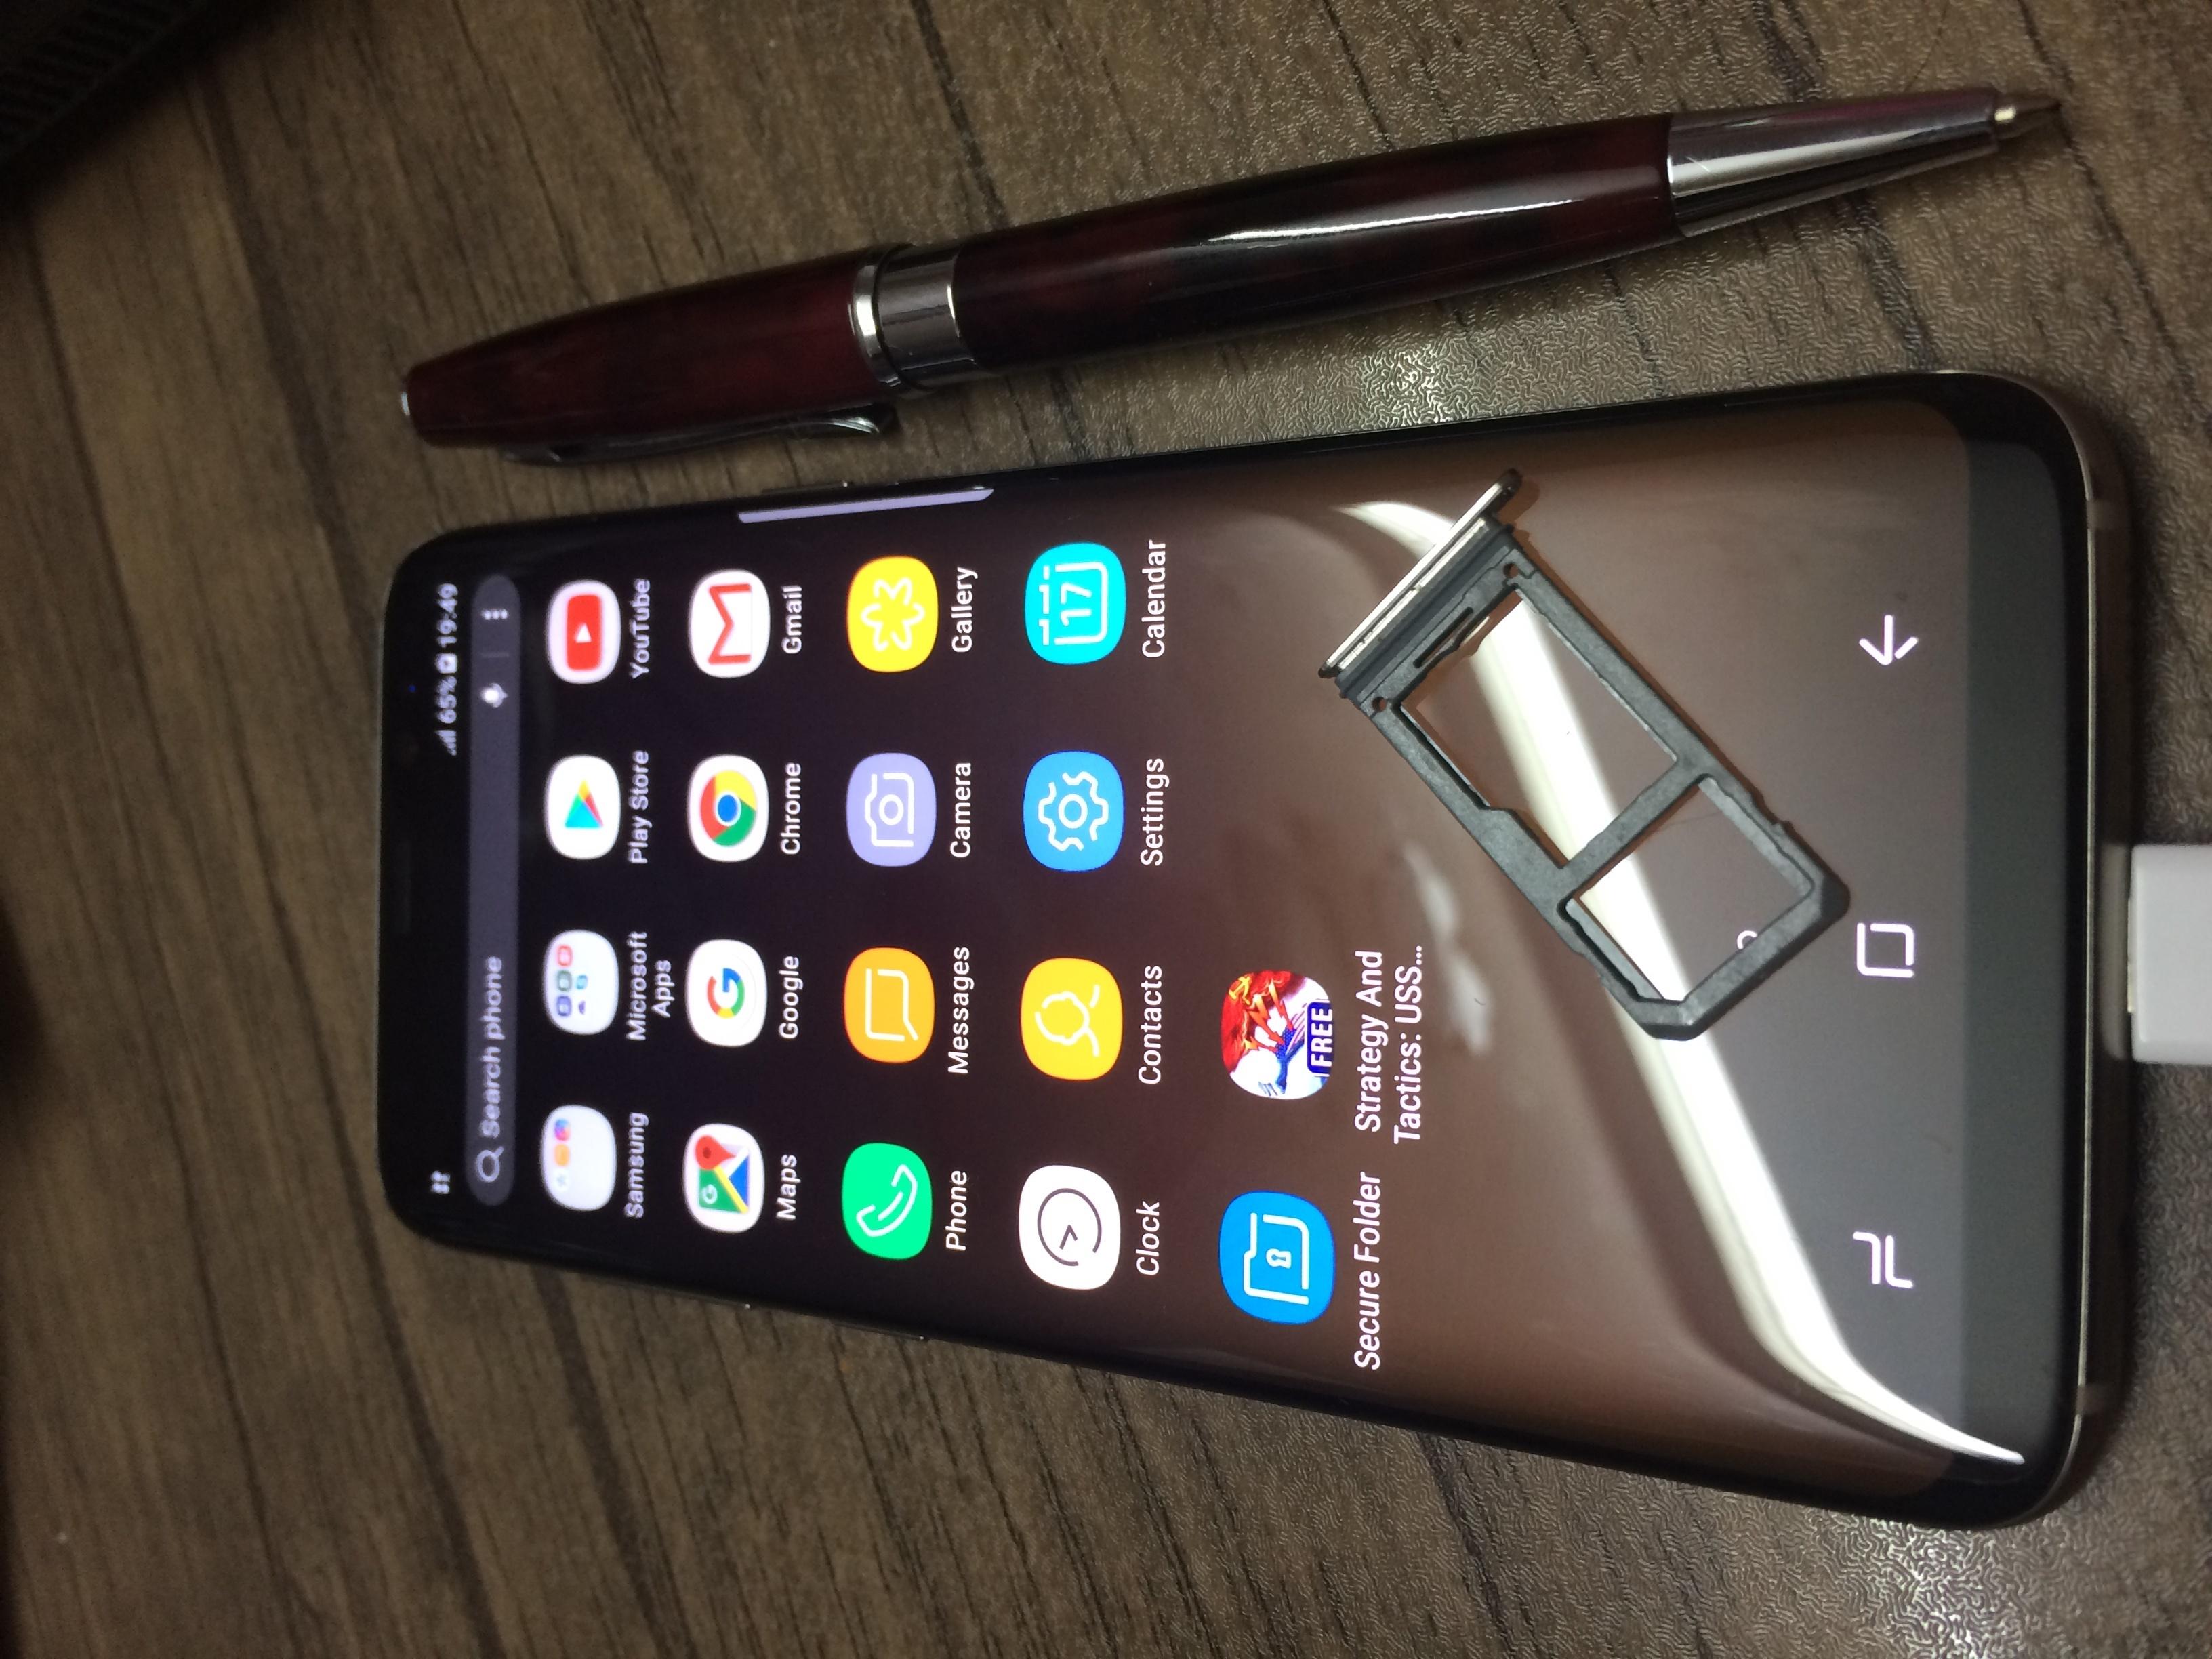 17 4 19 83014IMG 6138 - هندزآن گلکسی اس ۸: یک گوشی کاربرپسند و مهیج